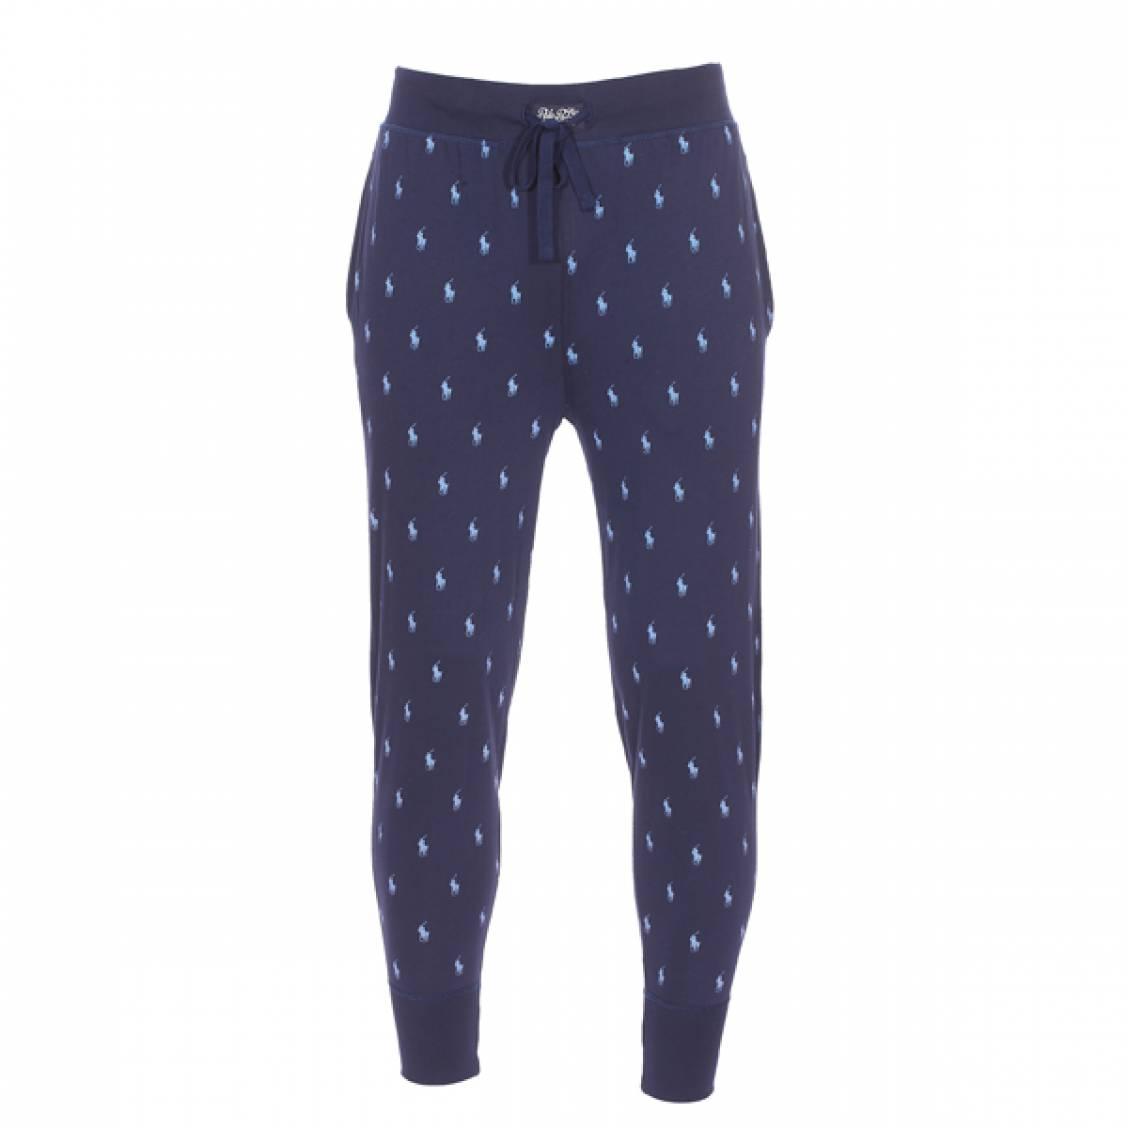 Pantalon de jogging léger  en coton bleu marine logotypé en bleu ciel